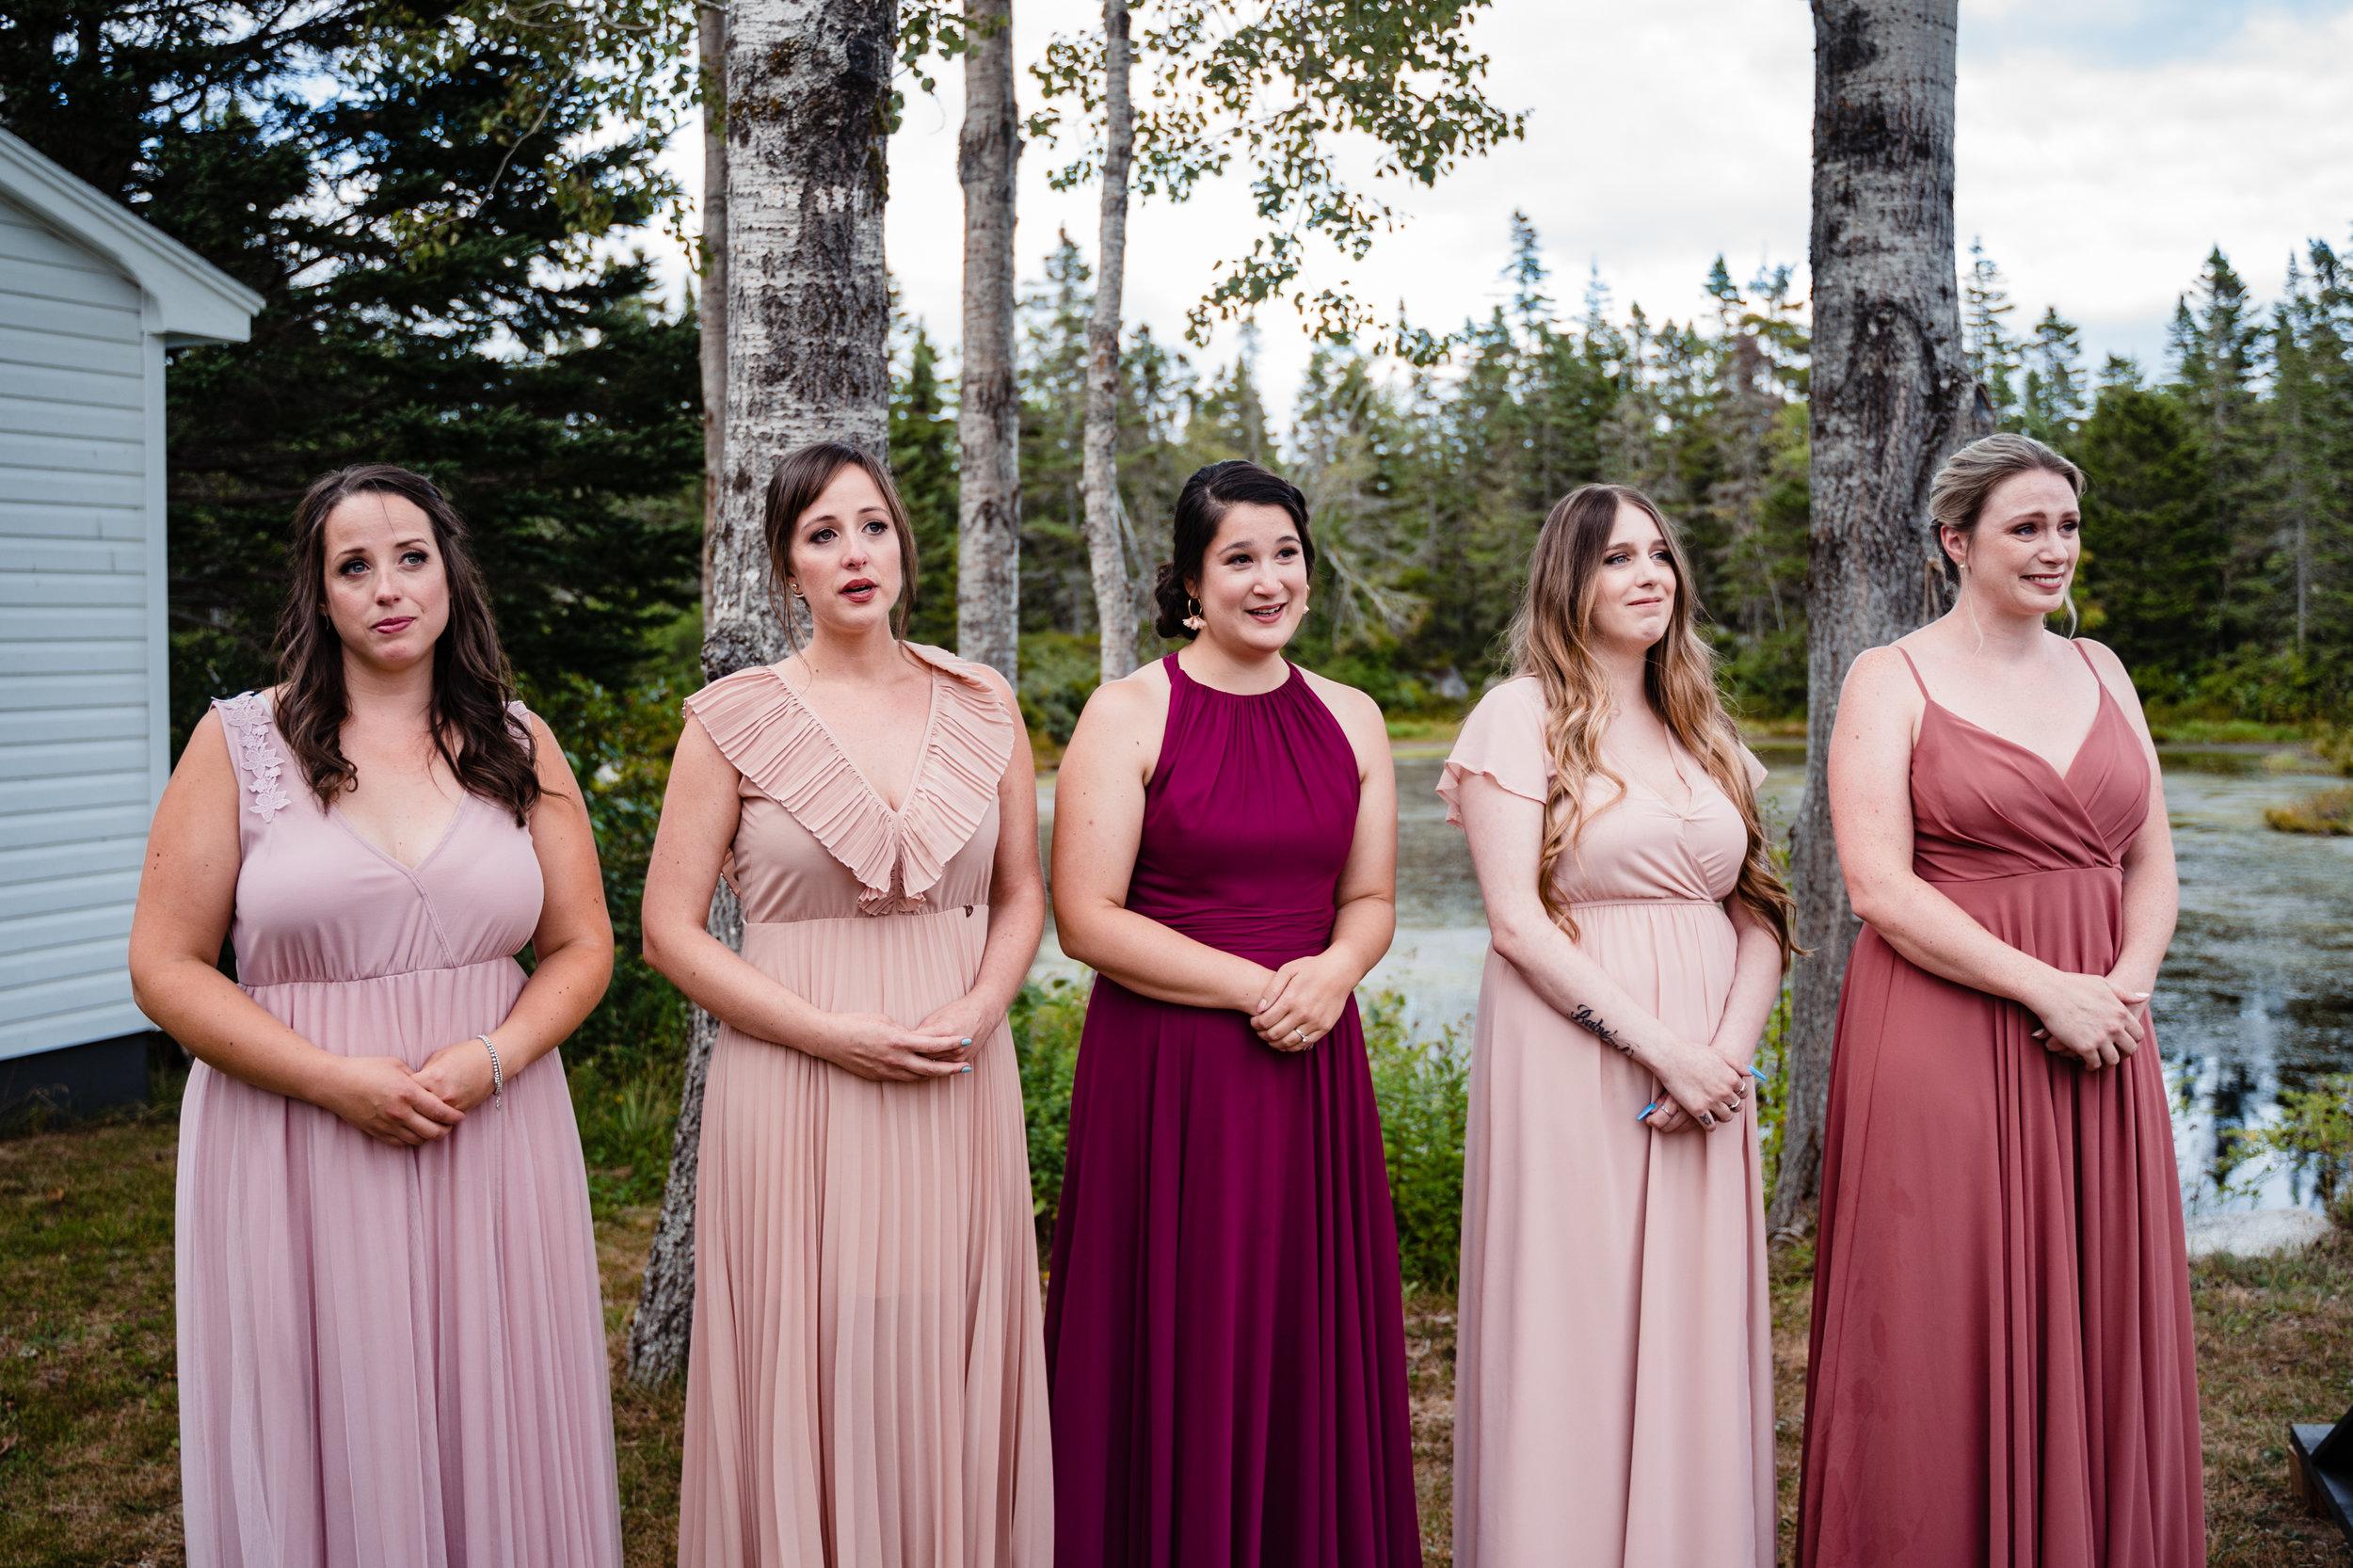 Janelle-Mitch-Halifax-Wedding-Nova-Scotia-Photography (104 of 163).jpg